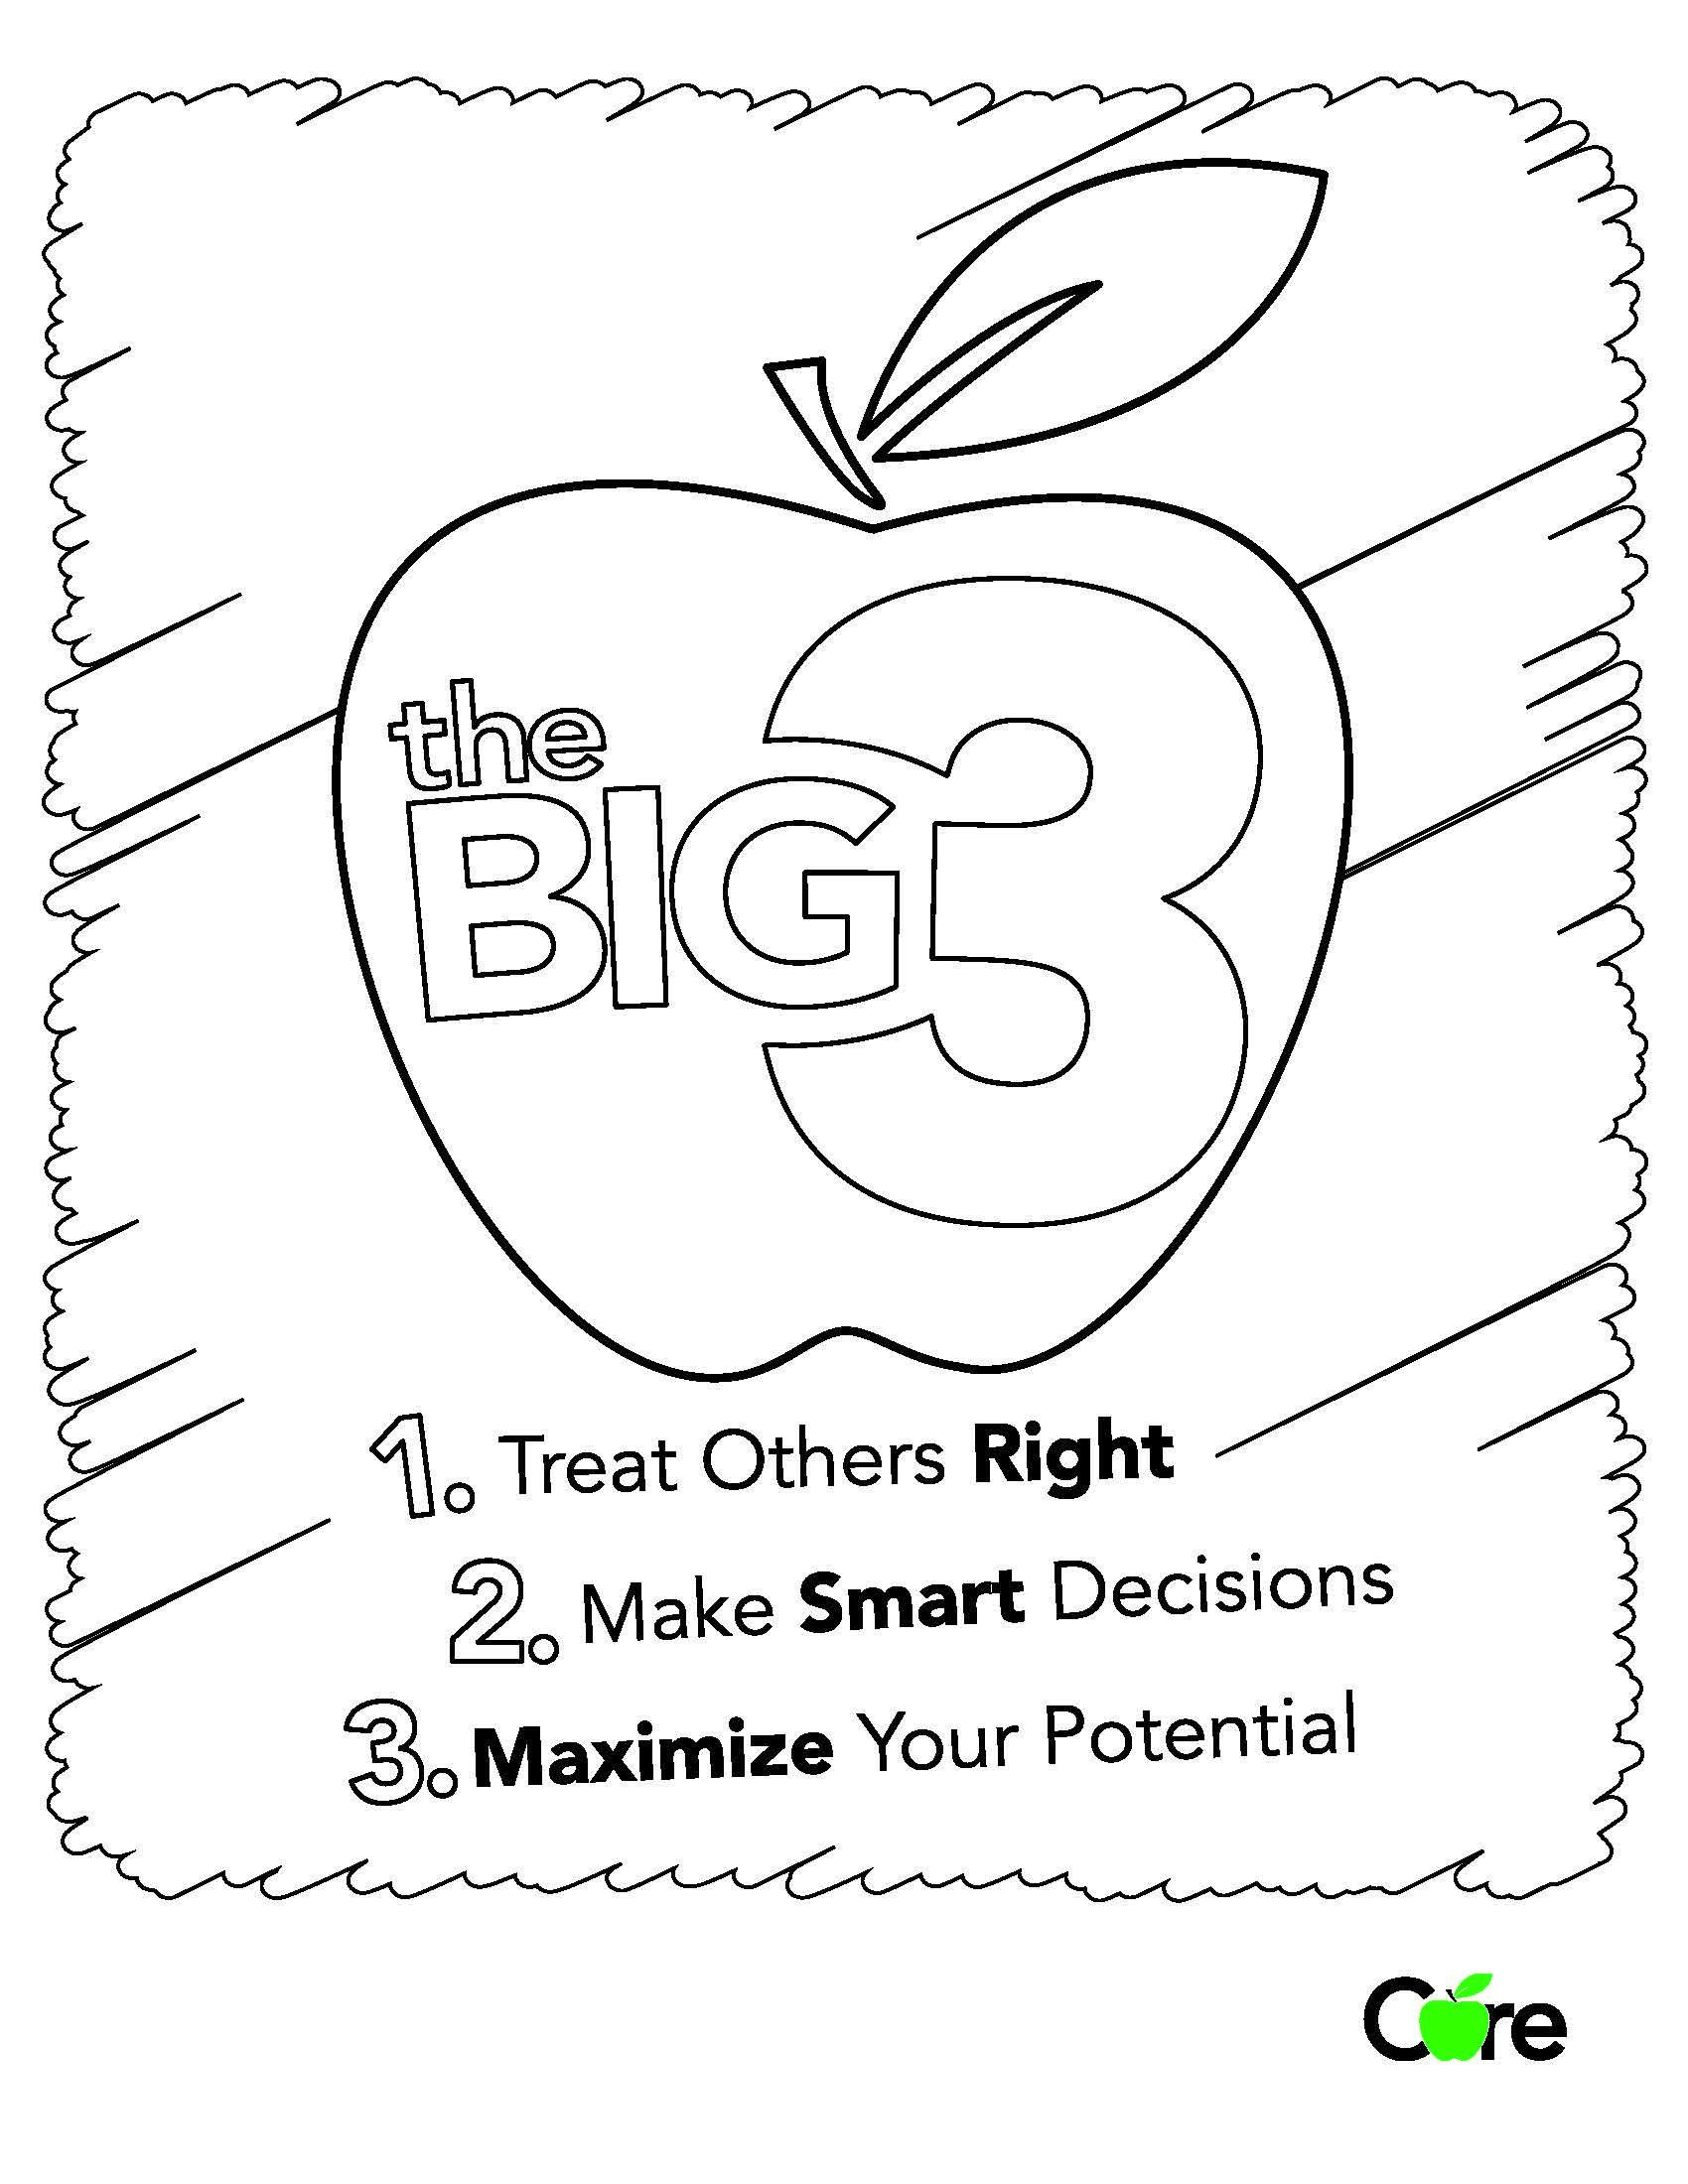 The Big 3 Coloring Sheet